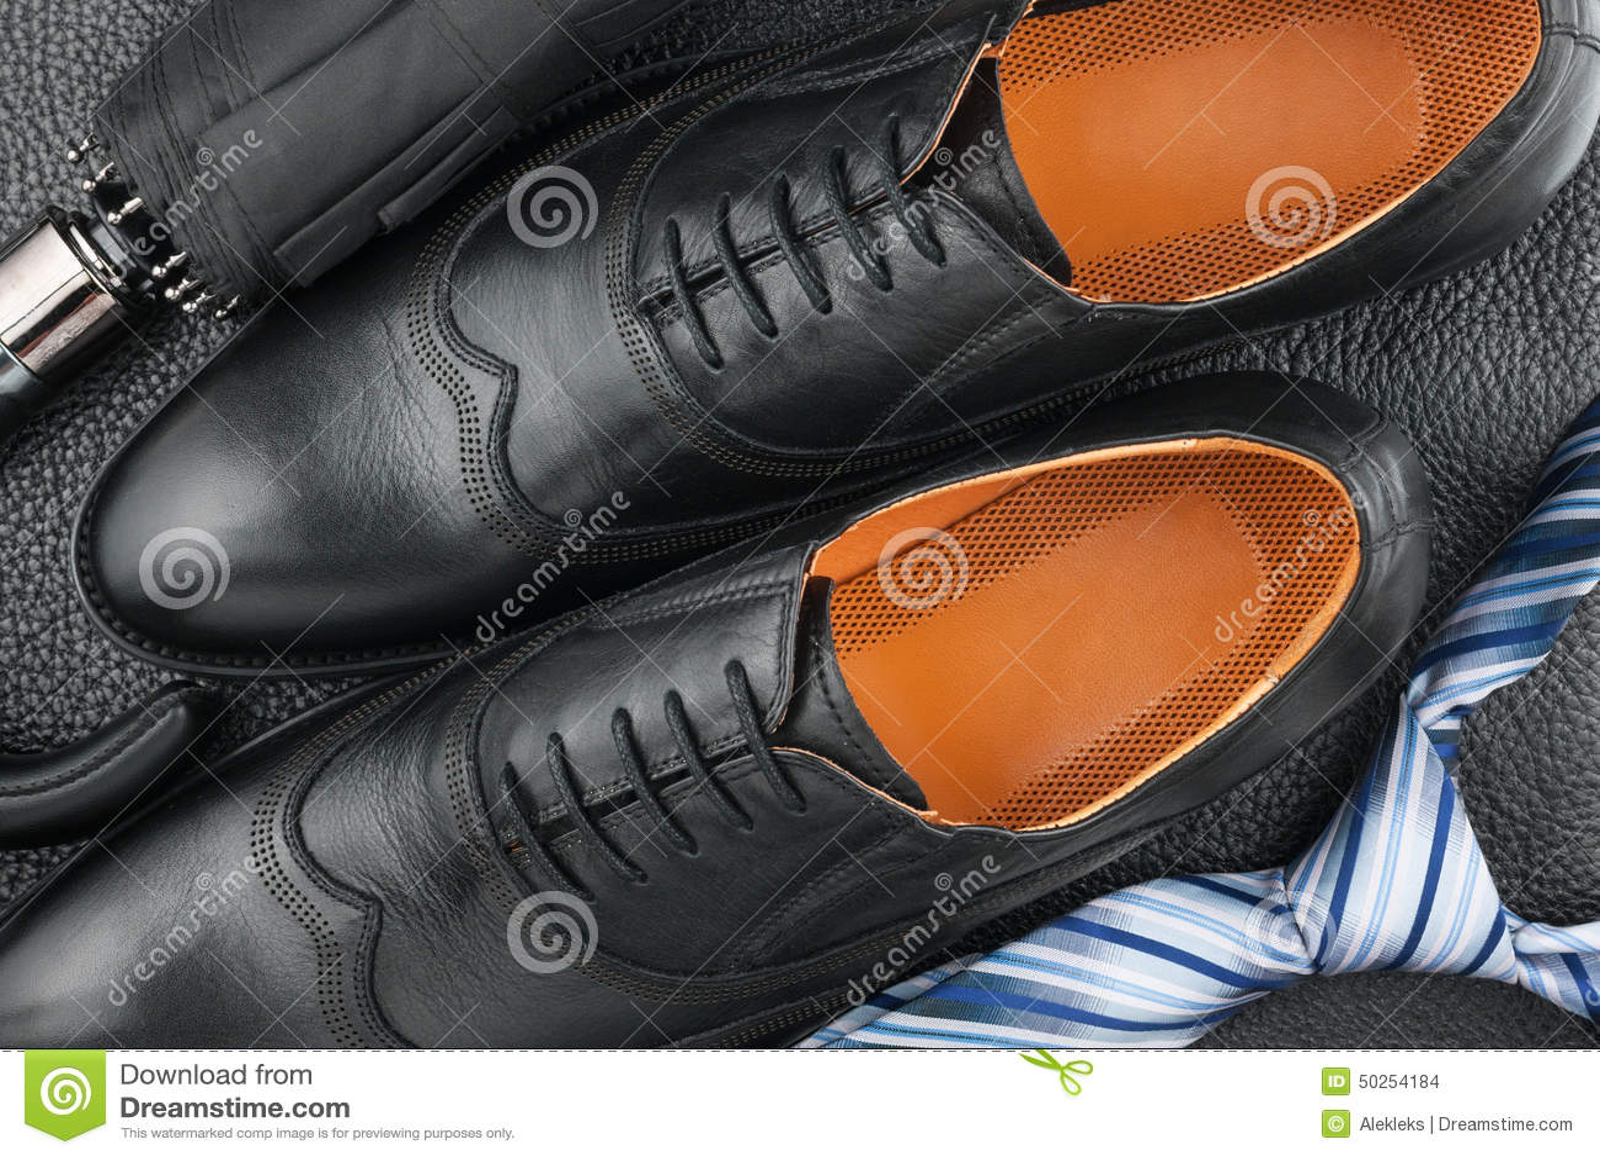 Classic mens shoes tie umbrella on the black leather stock photo classic men s shoes tie umbrella on the black leather ccuart Image collections